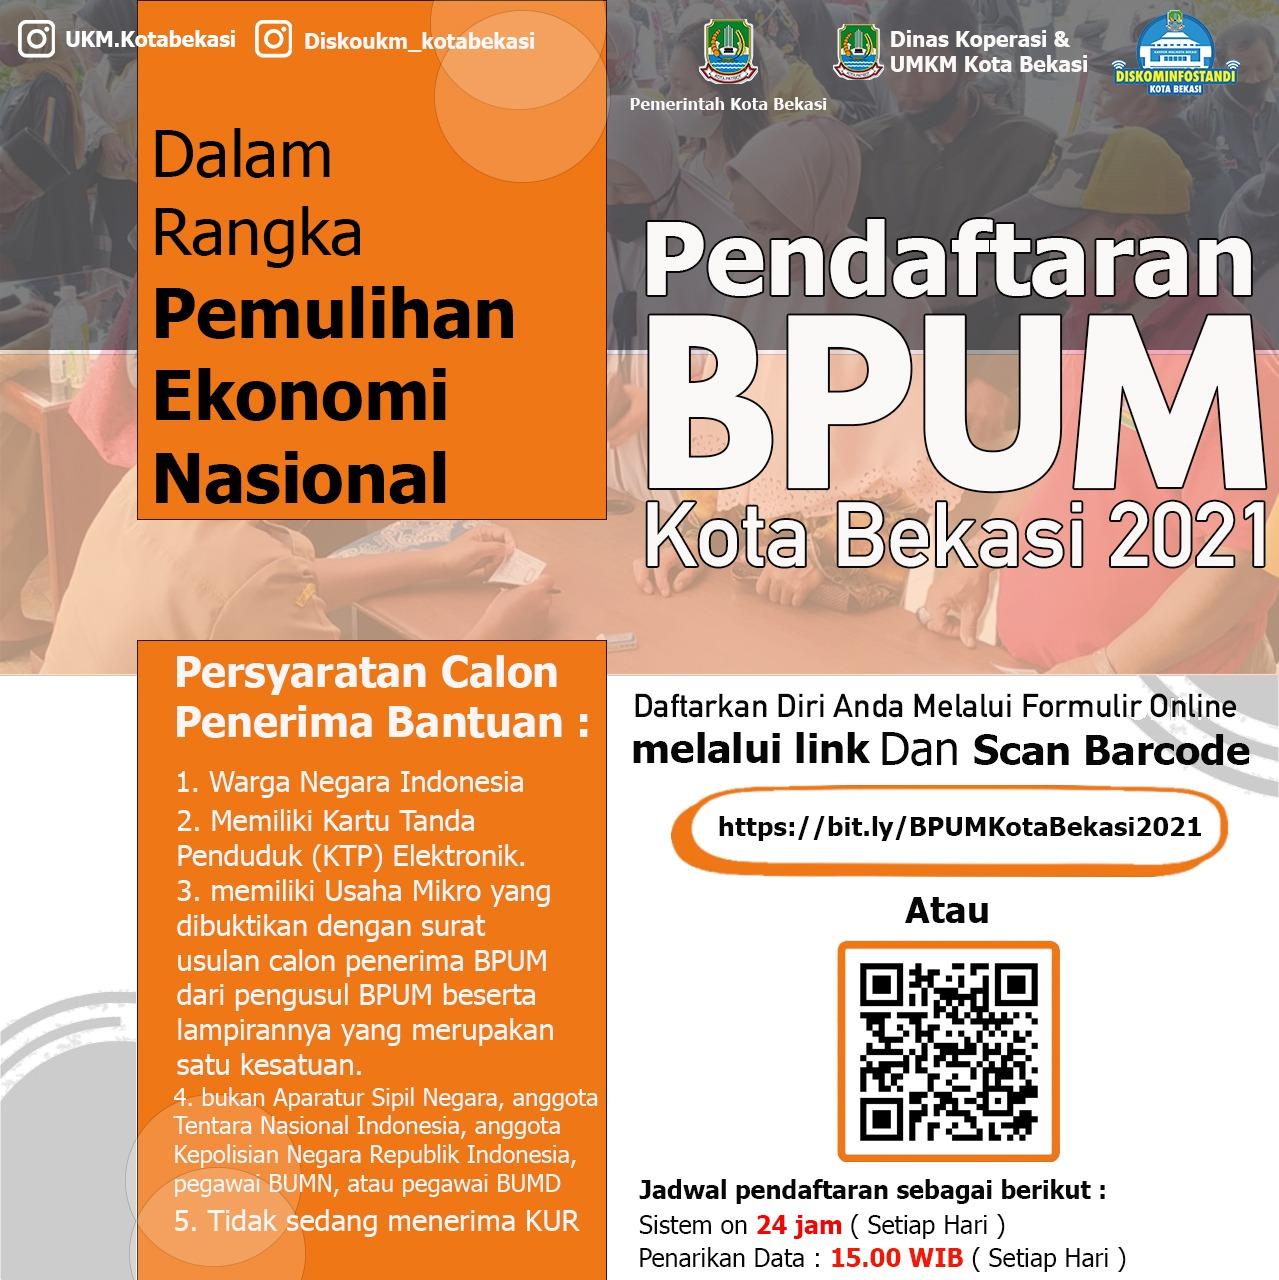 Pemkot Bekasi Keluarkan Surat Edaran Tata Cara Pendaftaran Online BPUM Tahun 2021